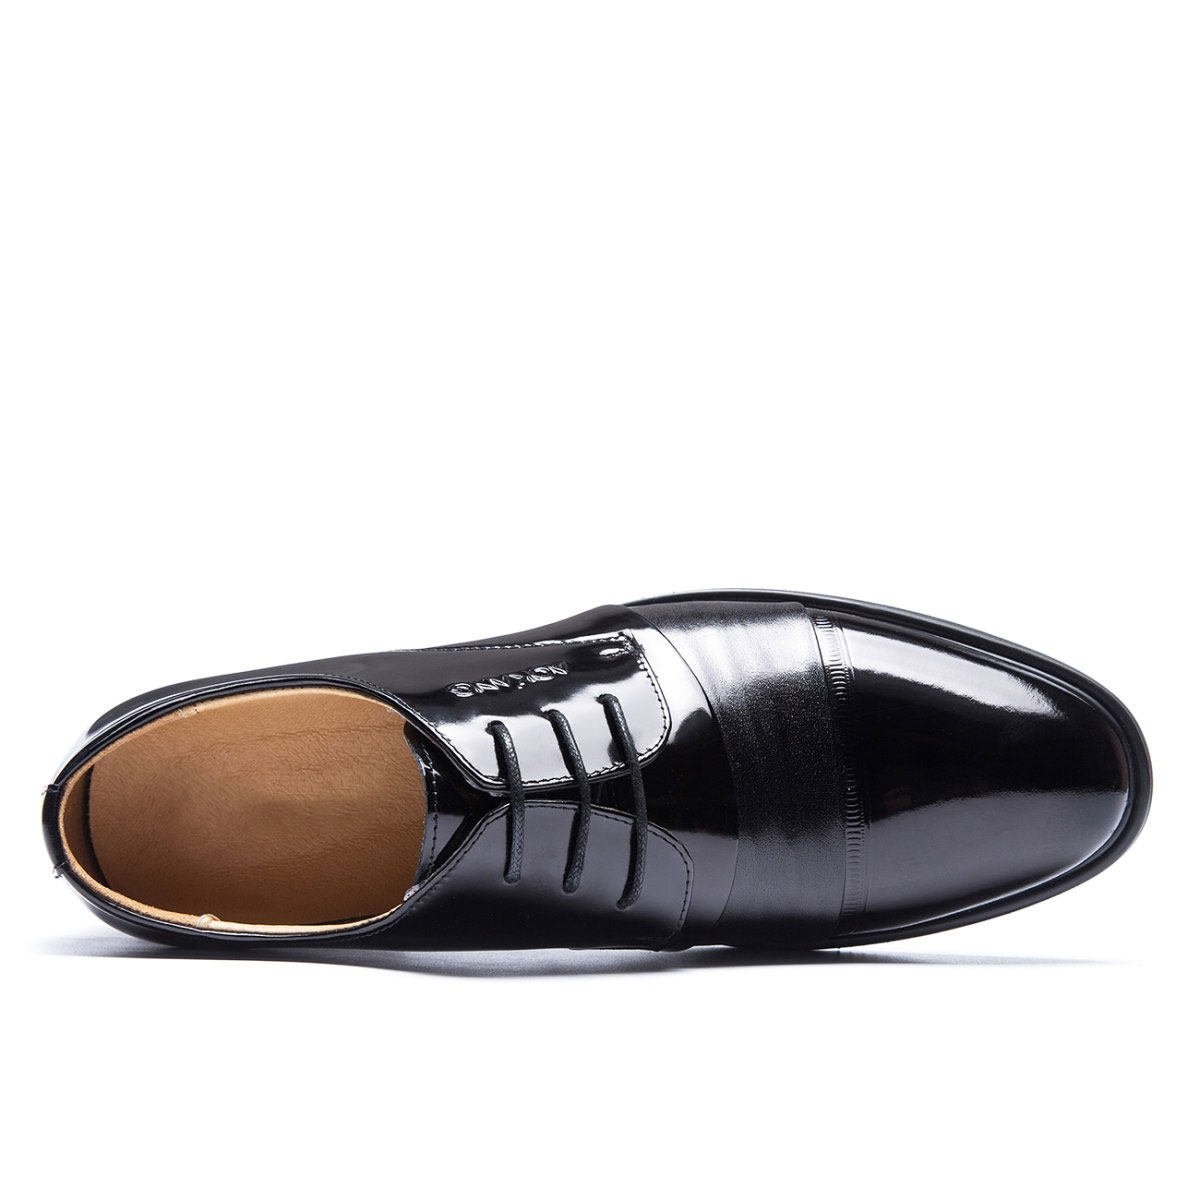 LEDLFIE Business Tipps Business LEDLFIE Dress Lederschuhe Lackleder schwarz baca9e